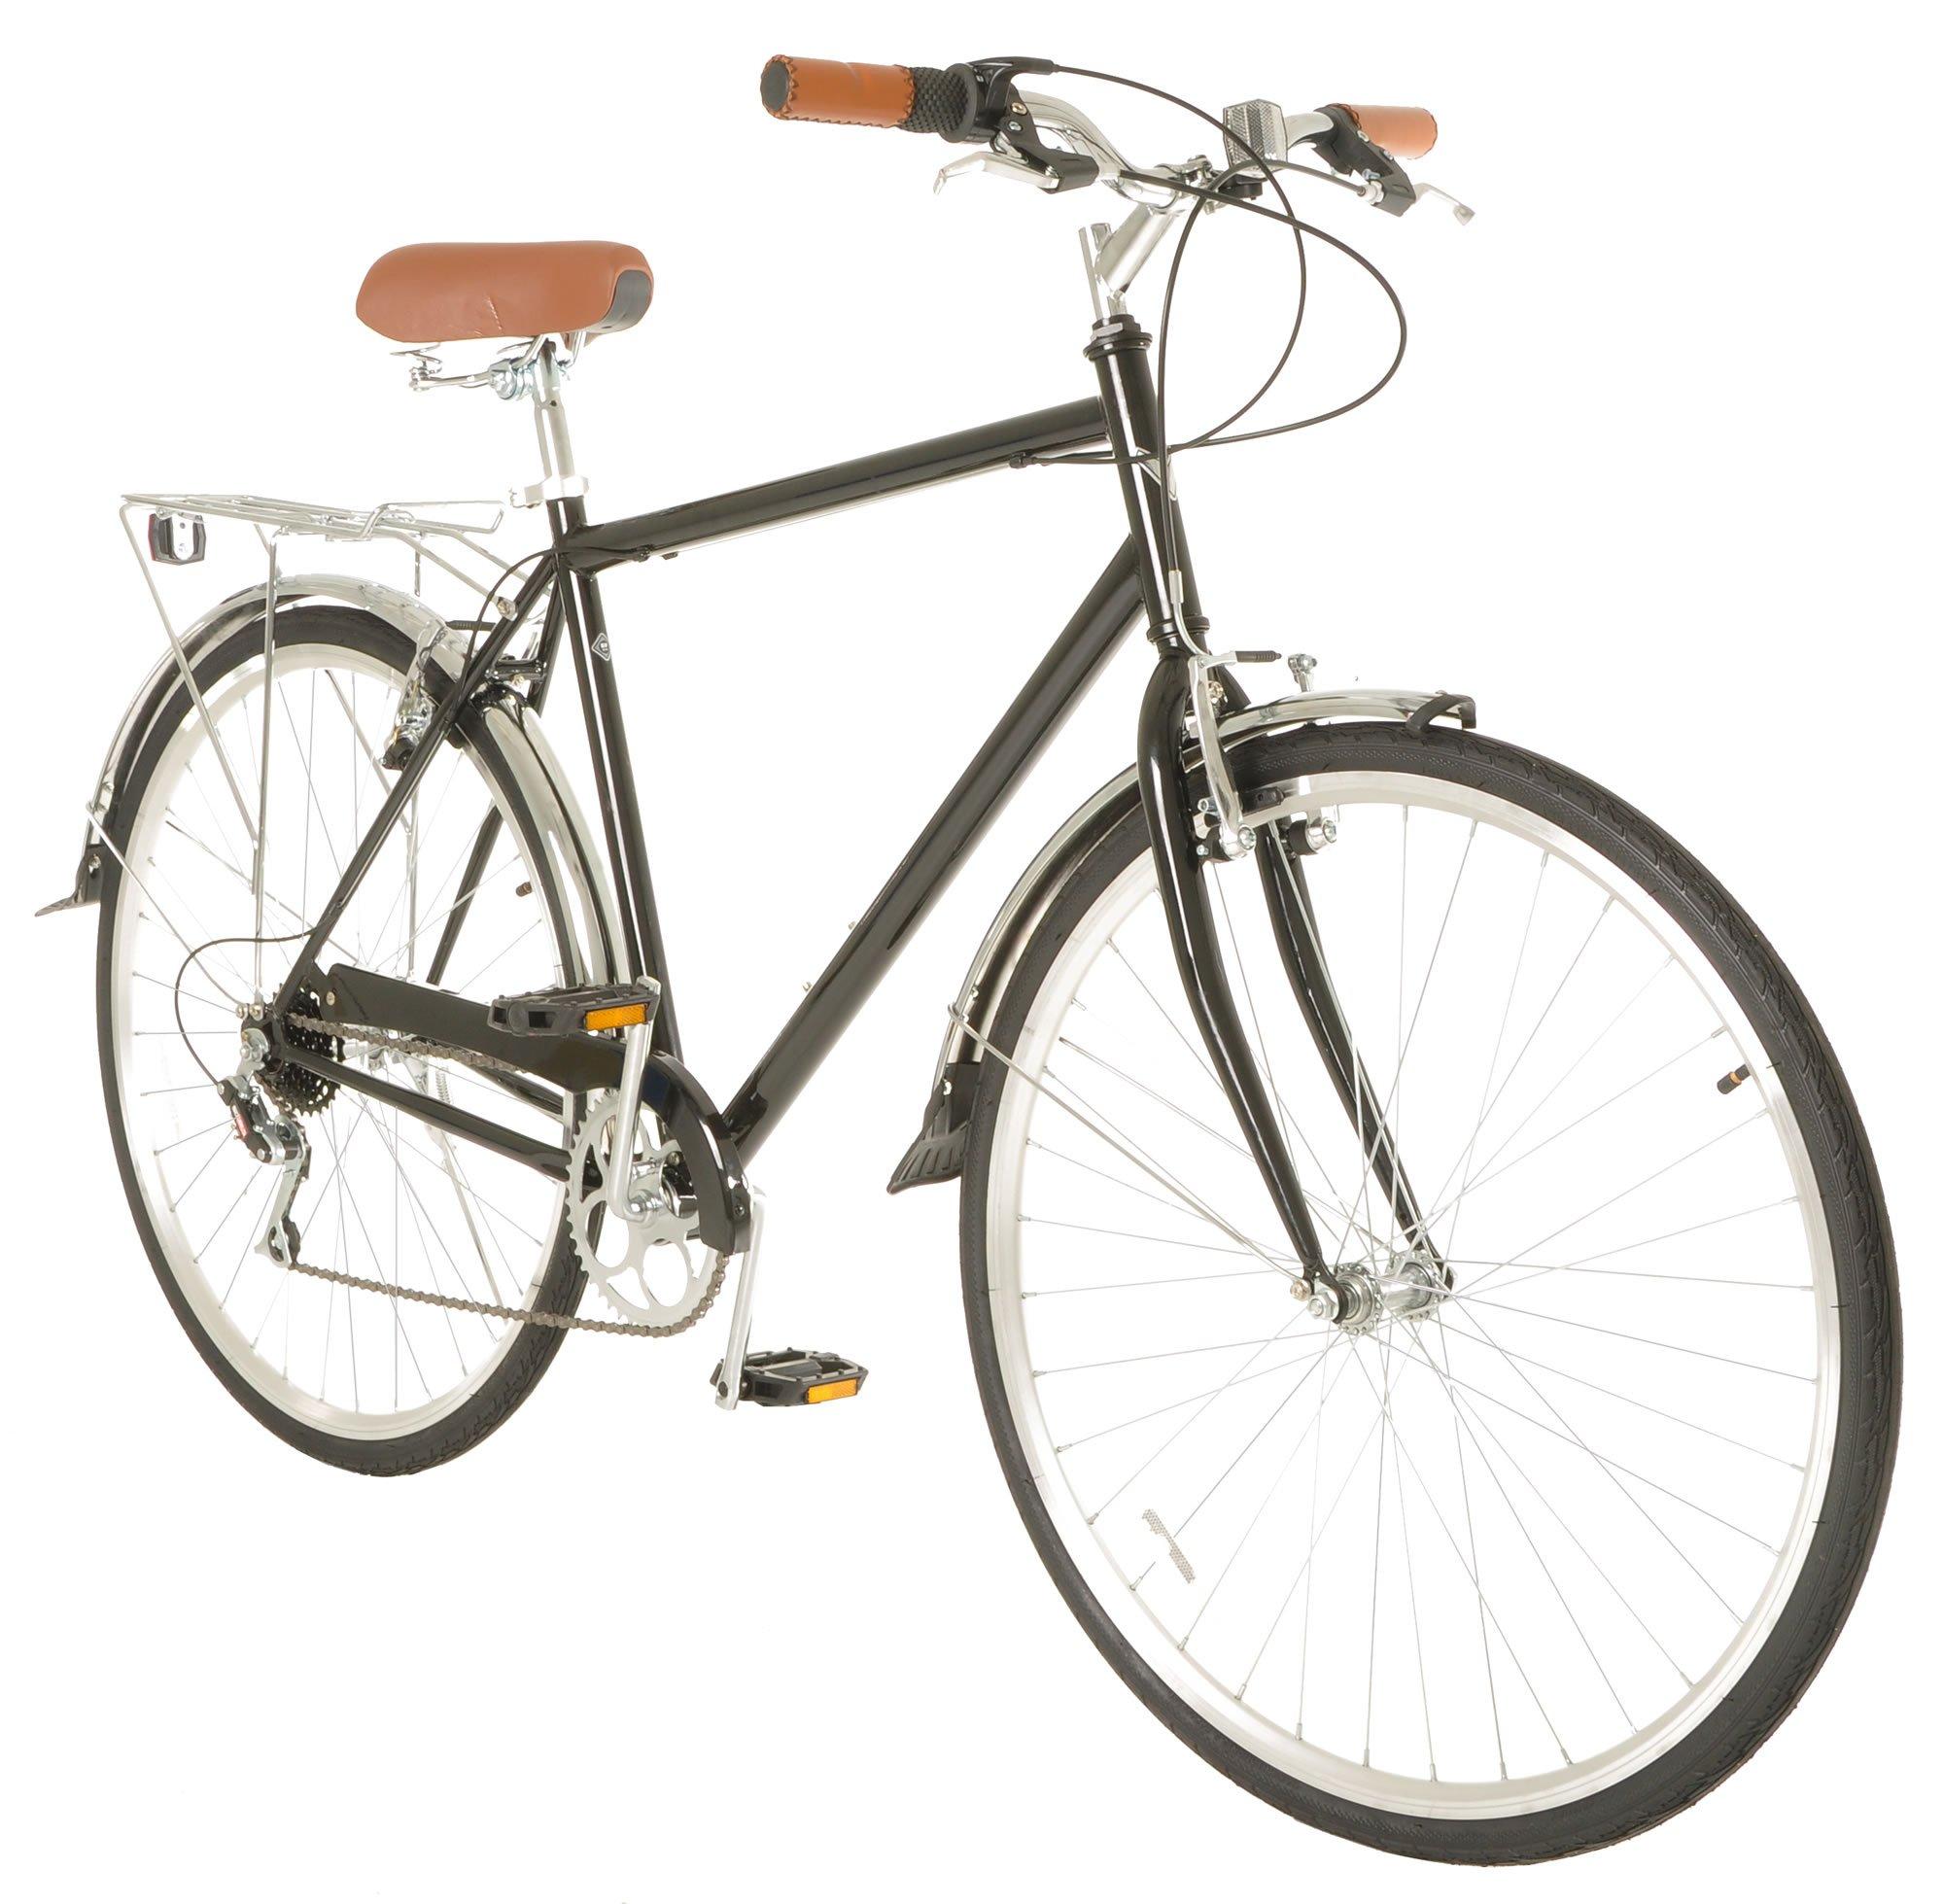 d017ebf5ba1 Buy Vilano Mens Hybrid Bike 700c Retro City Commuter in Cheap Price ...